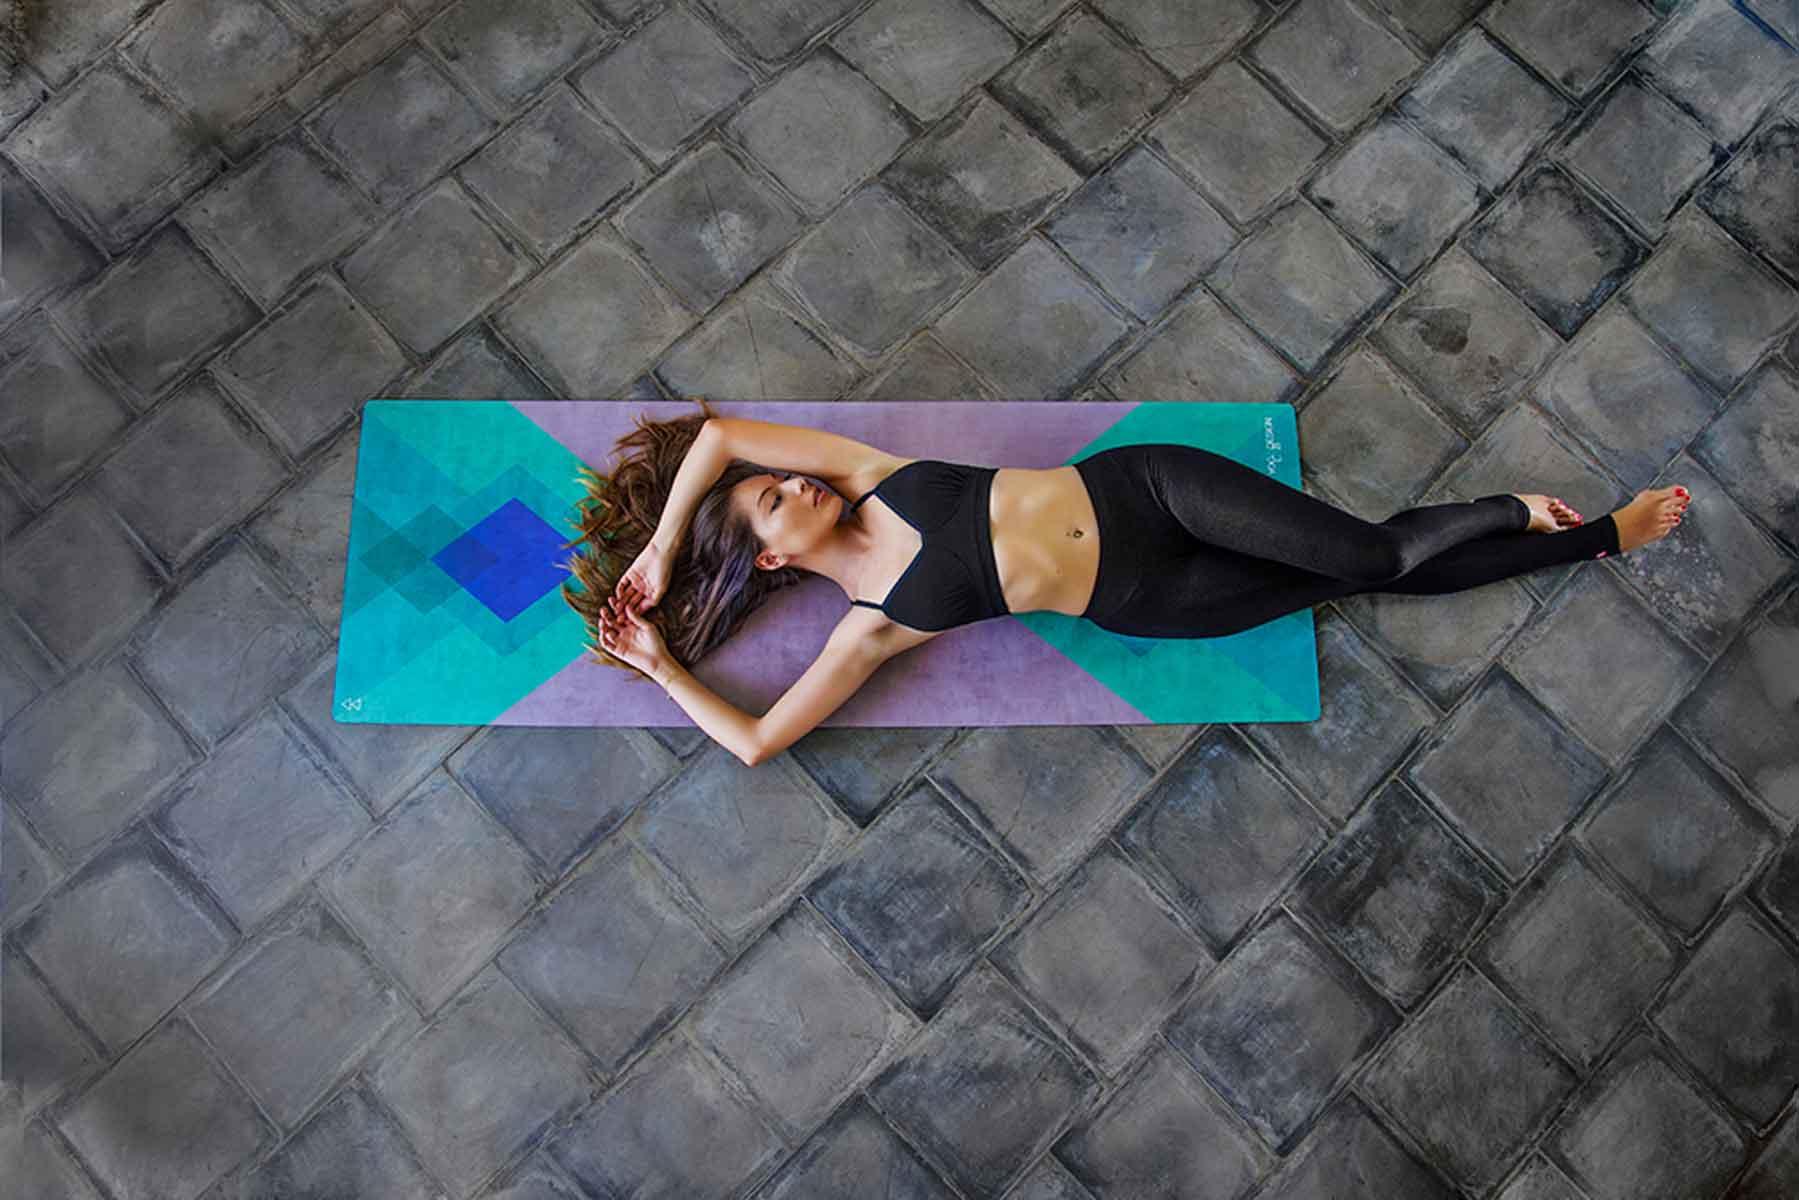 travel harmonyprofessionalxlmat yoga shop professional canada jadeyoga harmony mat xw